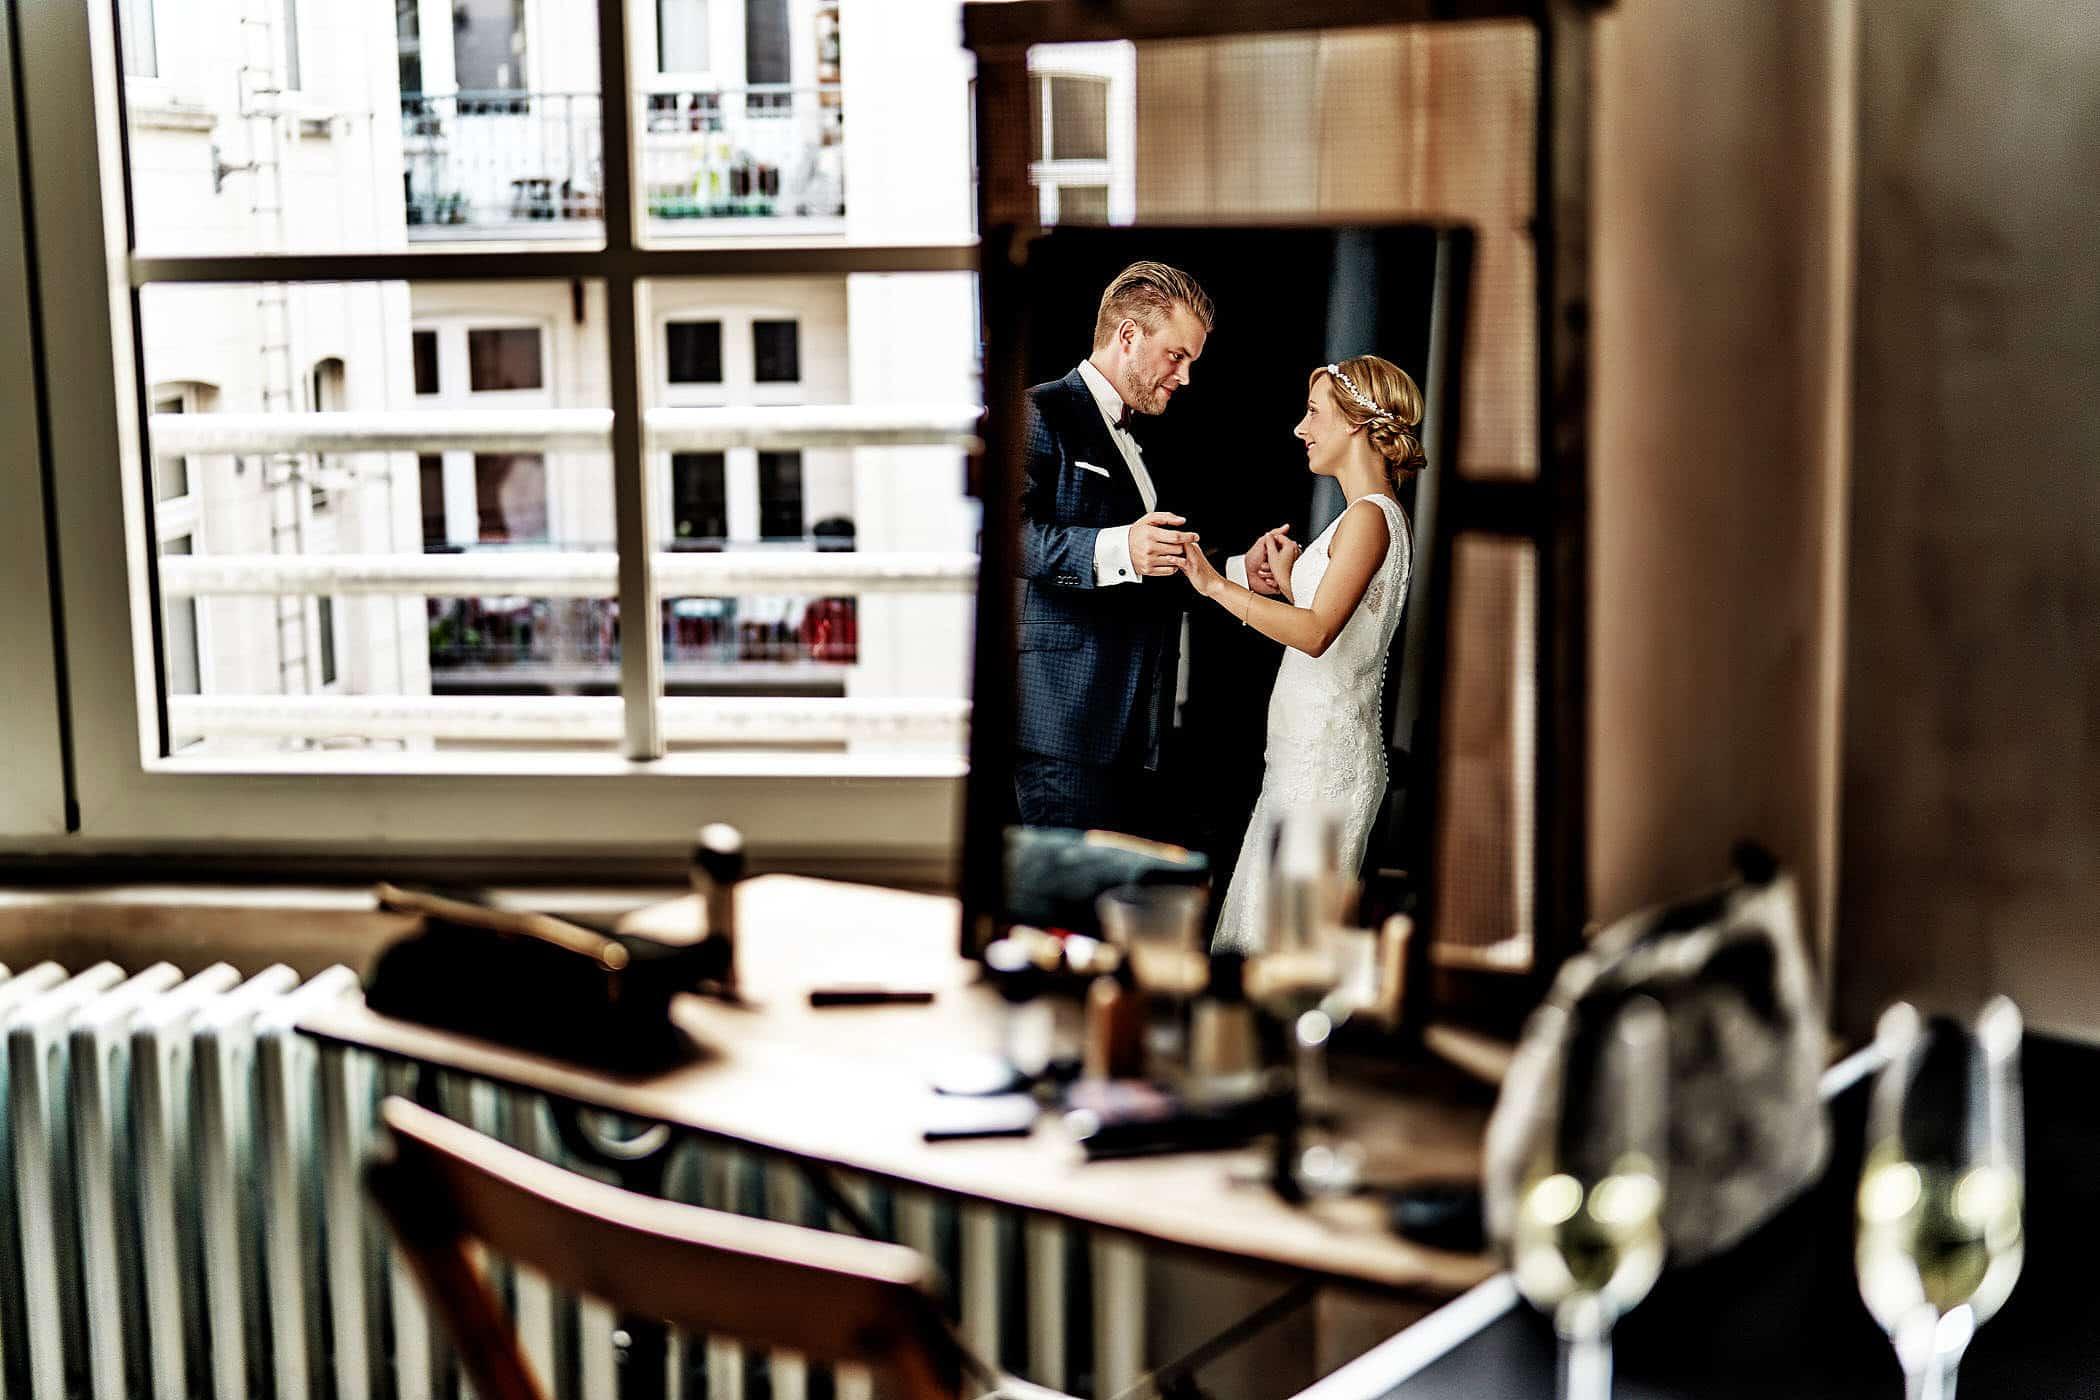 Hochzeit in Köln • Stefan & Antonia